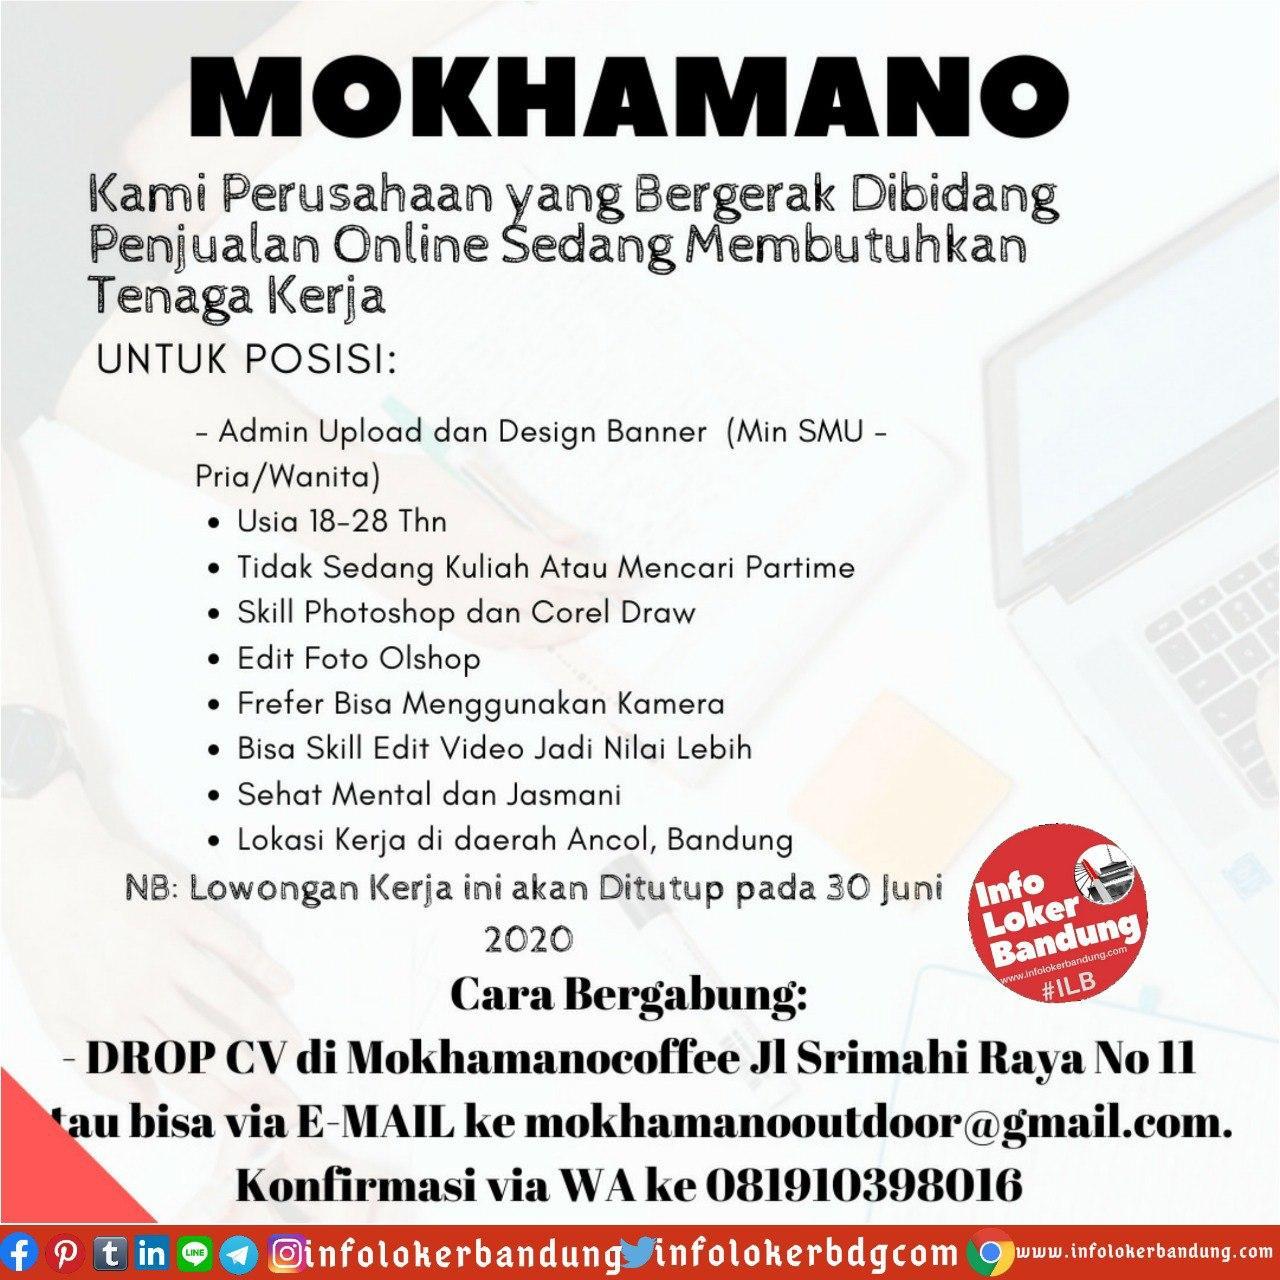 Lowongan Kerja Mokhamano Bandung Juni 2020